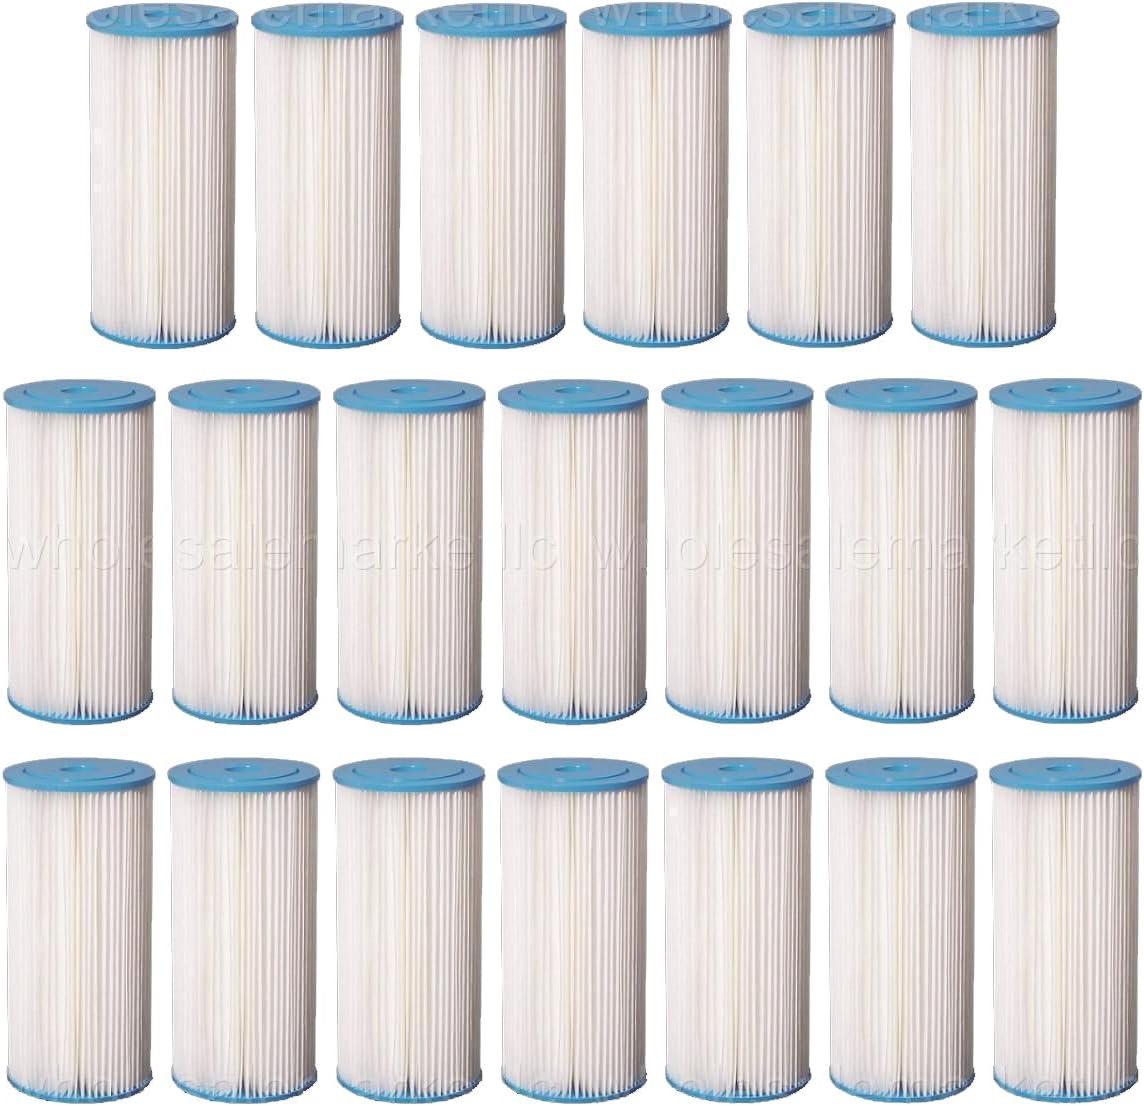 Big Blue Pleated Sediment Water Filters 20 Washable 4.5 x 10 Cardridges 5 Micron